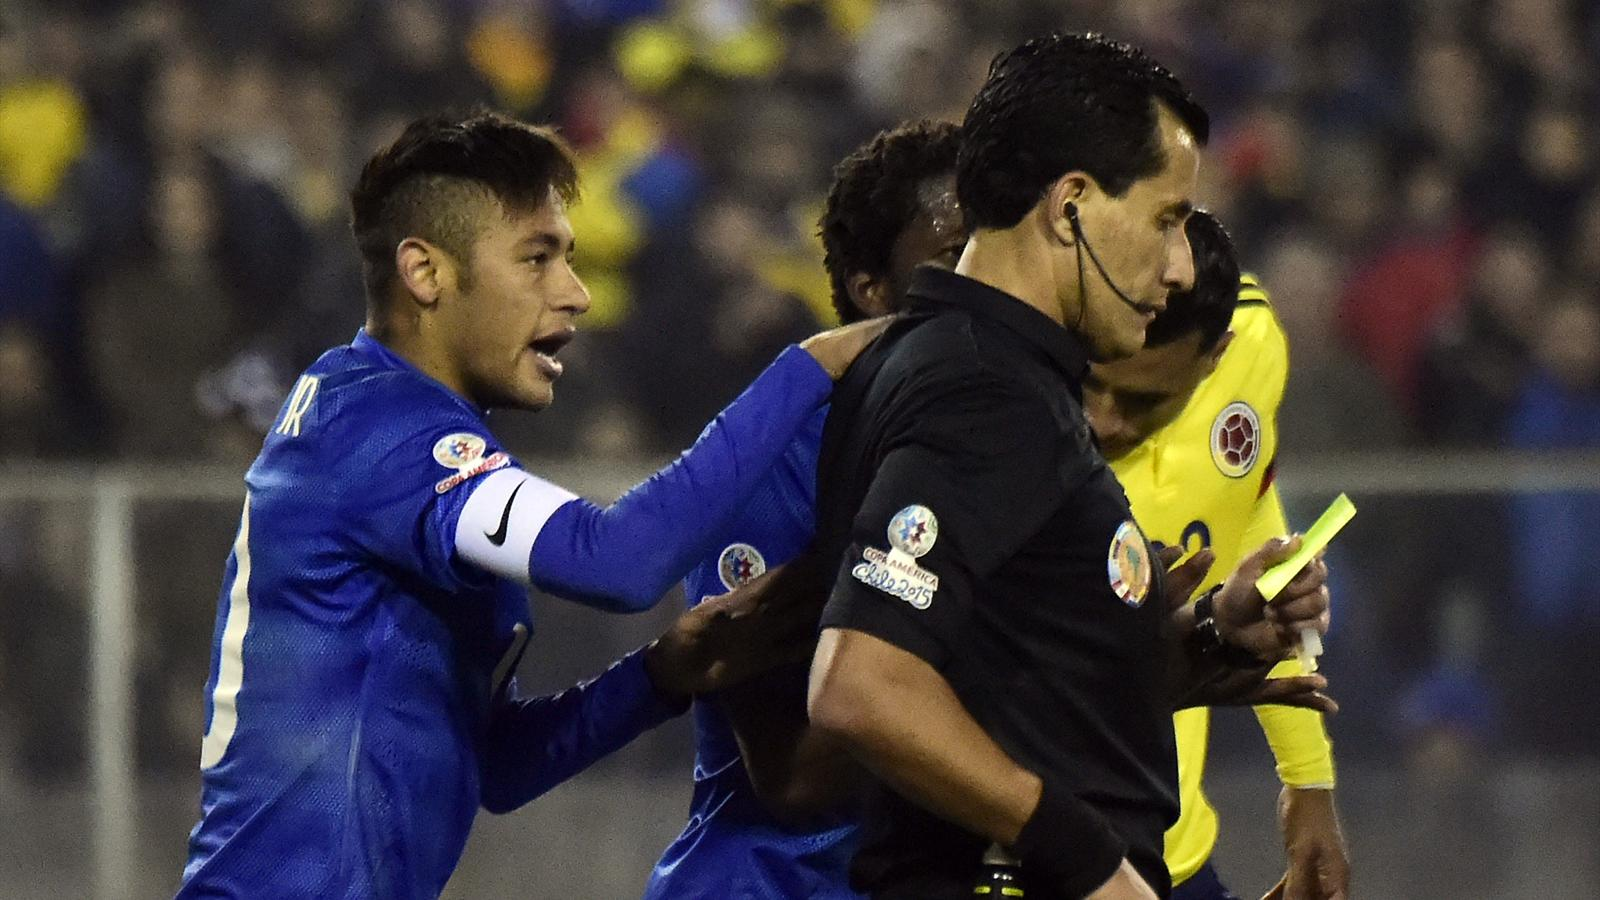 Coppa America, Neymar perde la testa